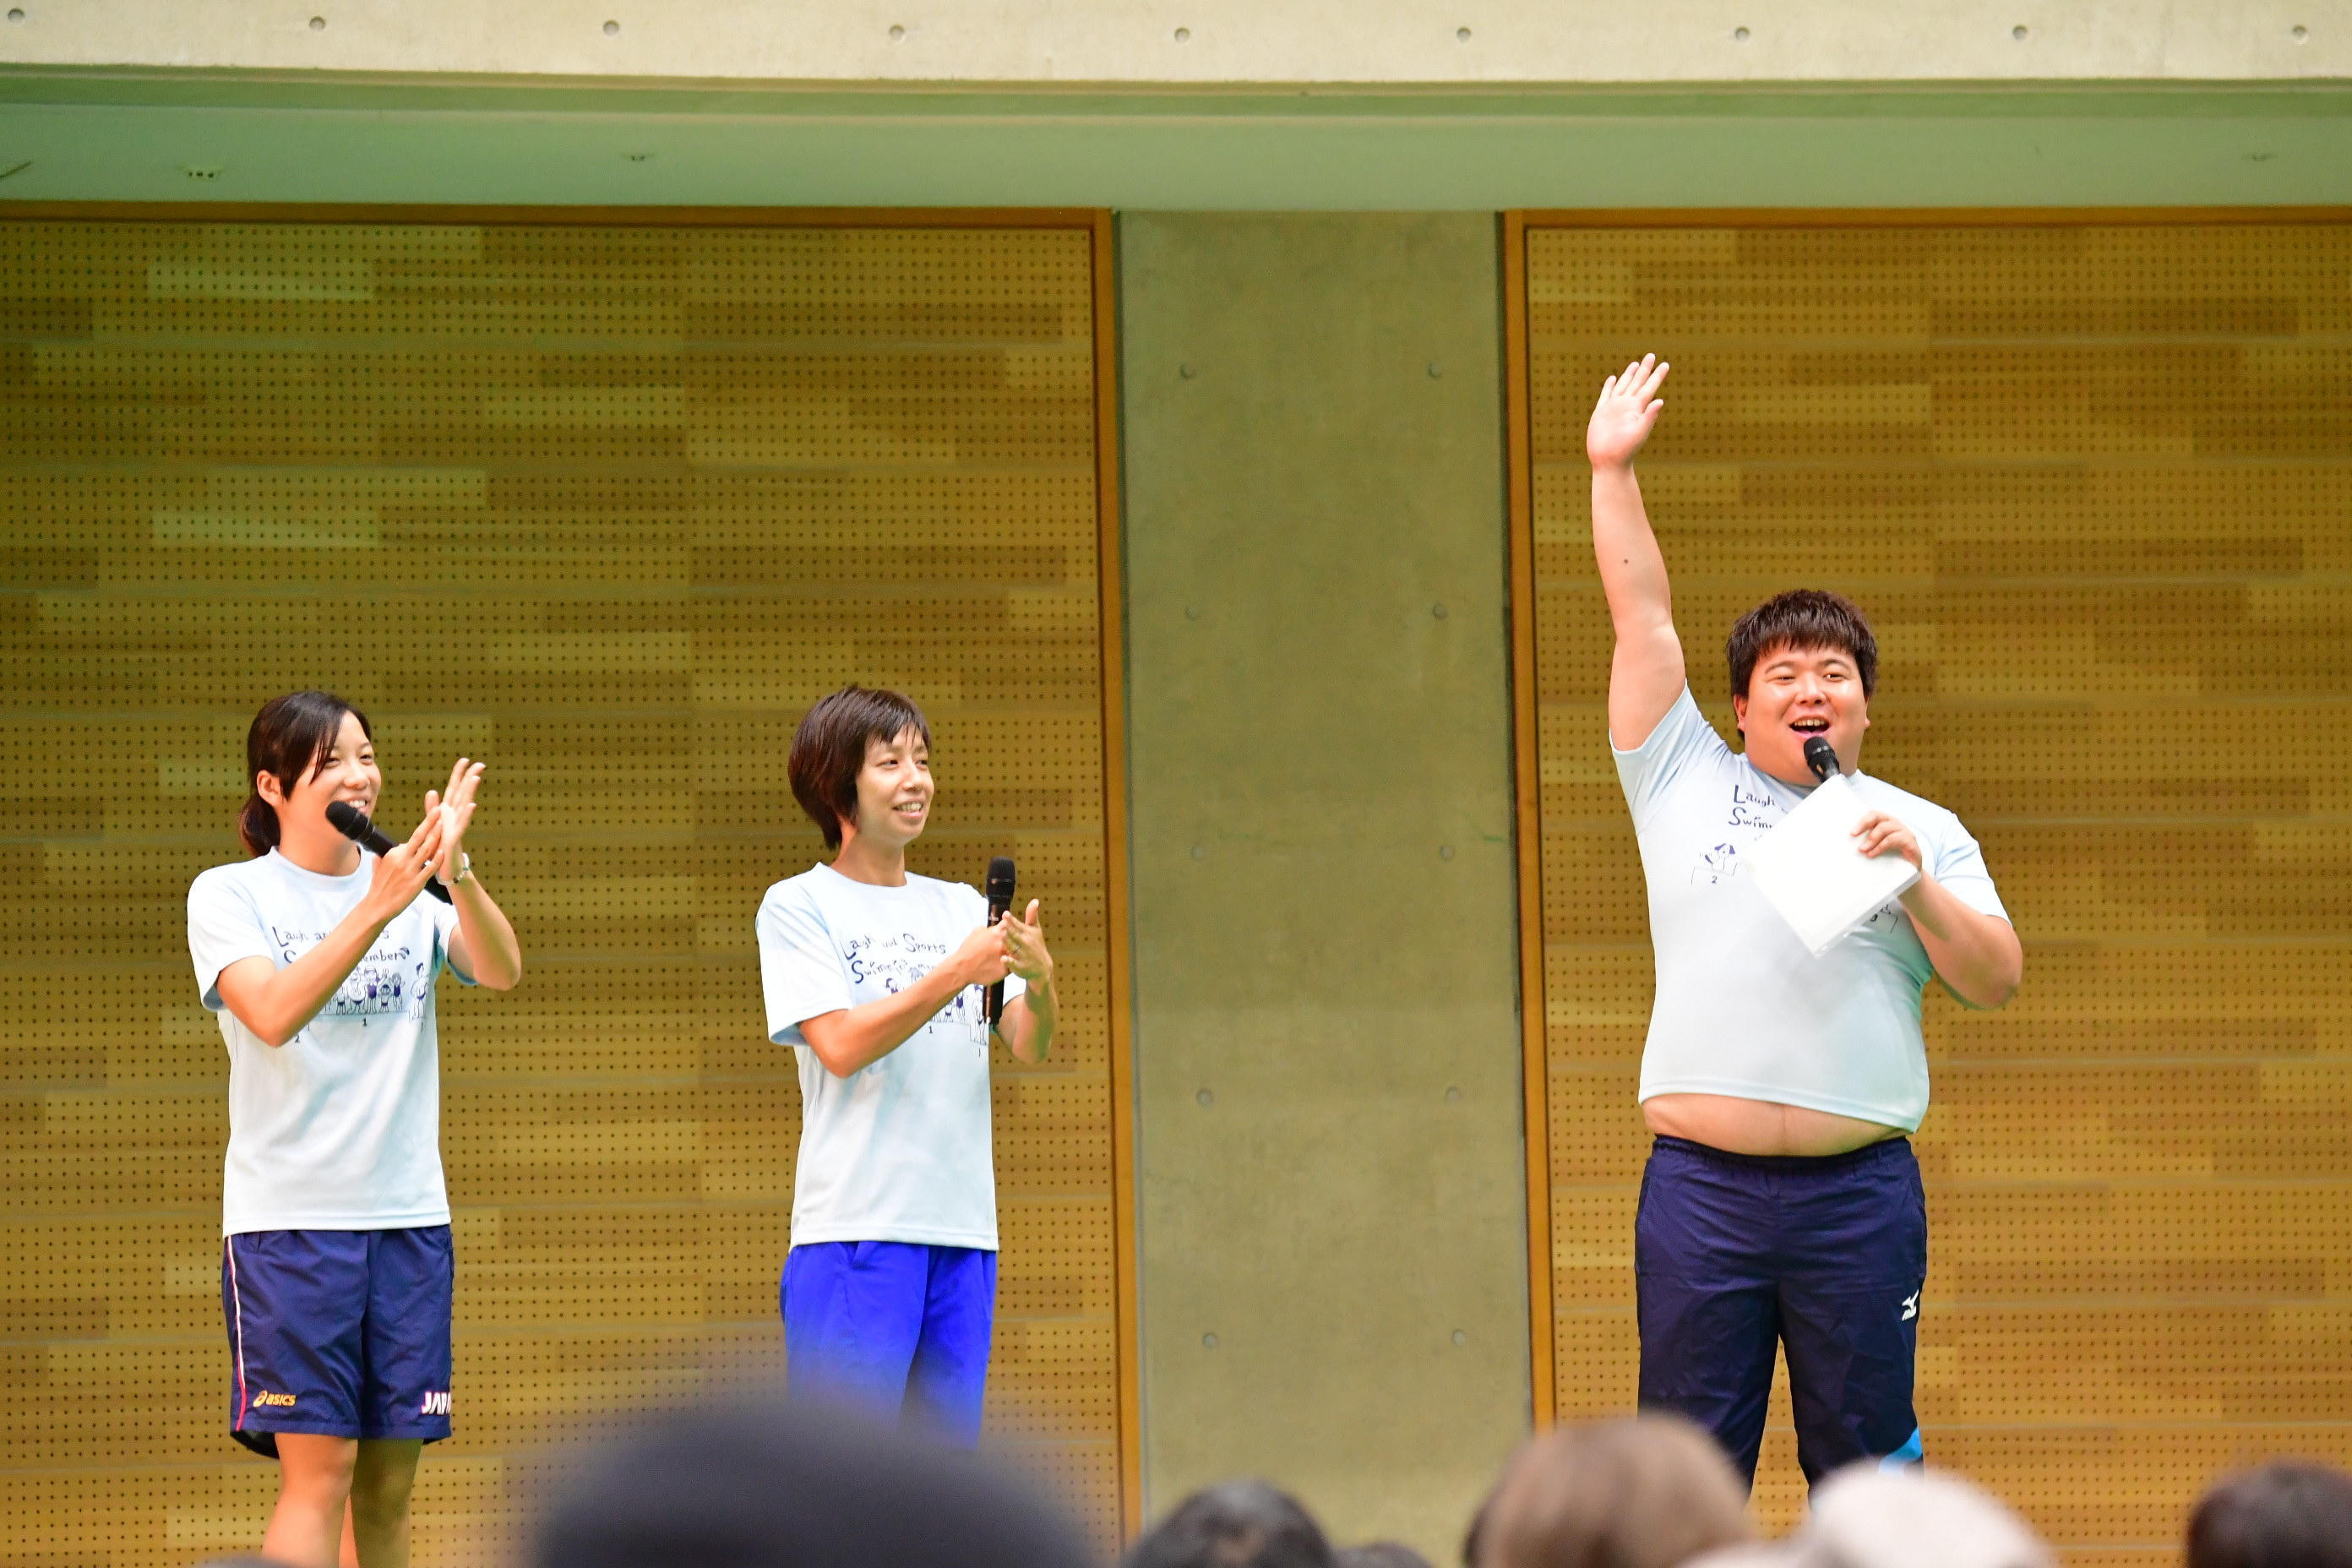 http://news.yoshimoto.co.jp/20180926011103-b211d964a47e877fea4c89a6525e7cde224b94b0.jpg